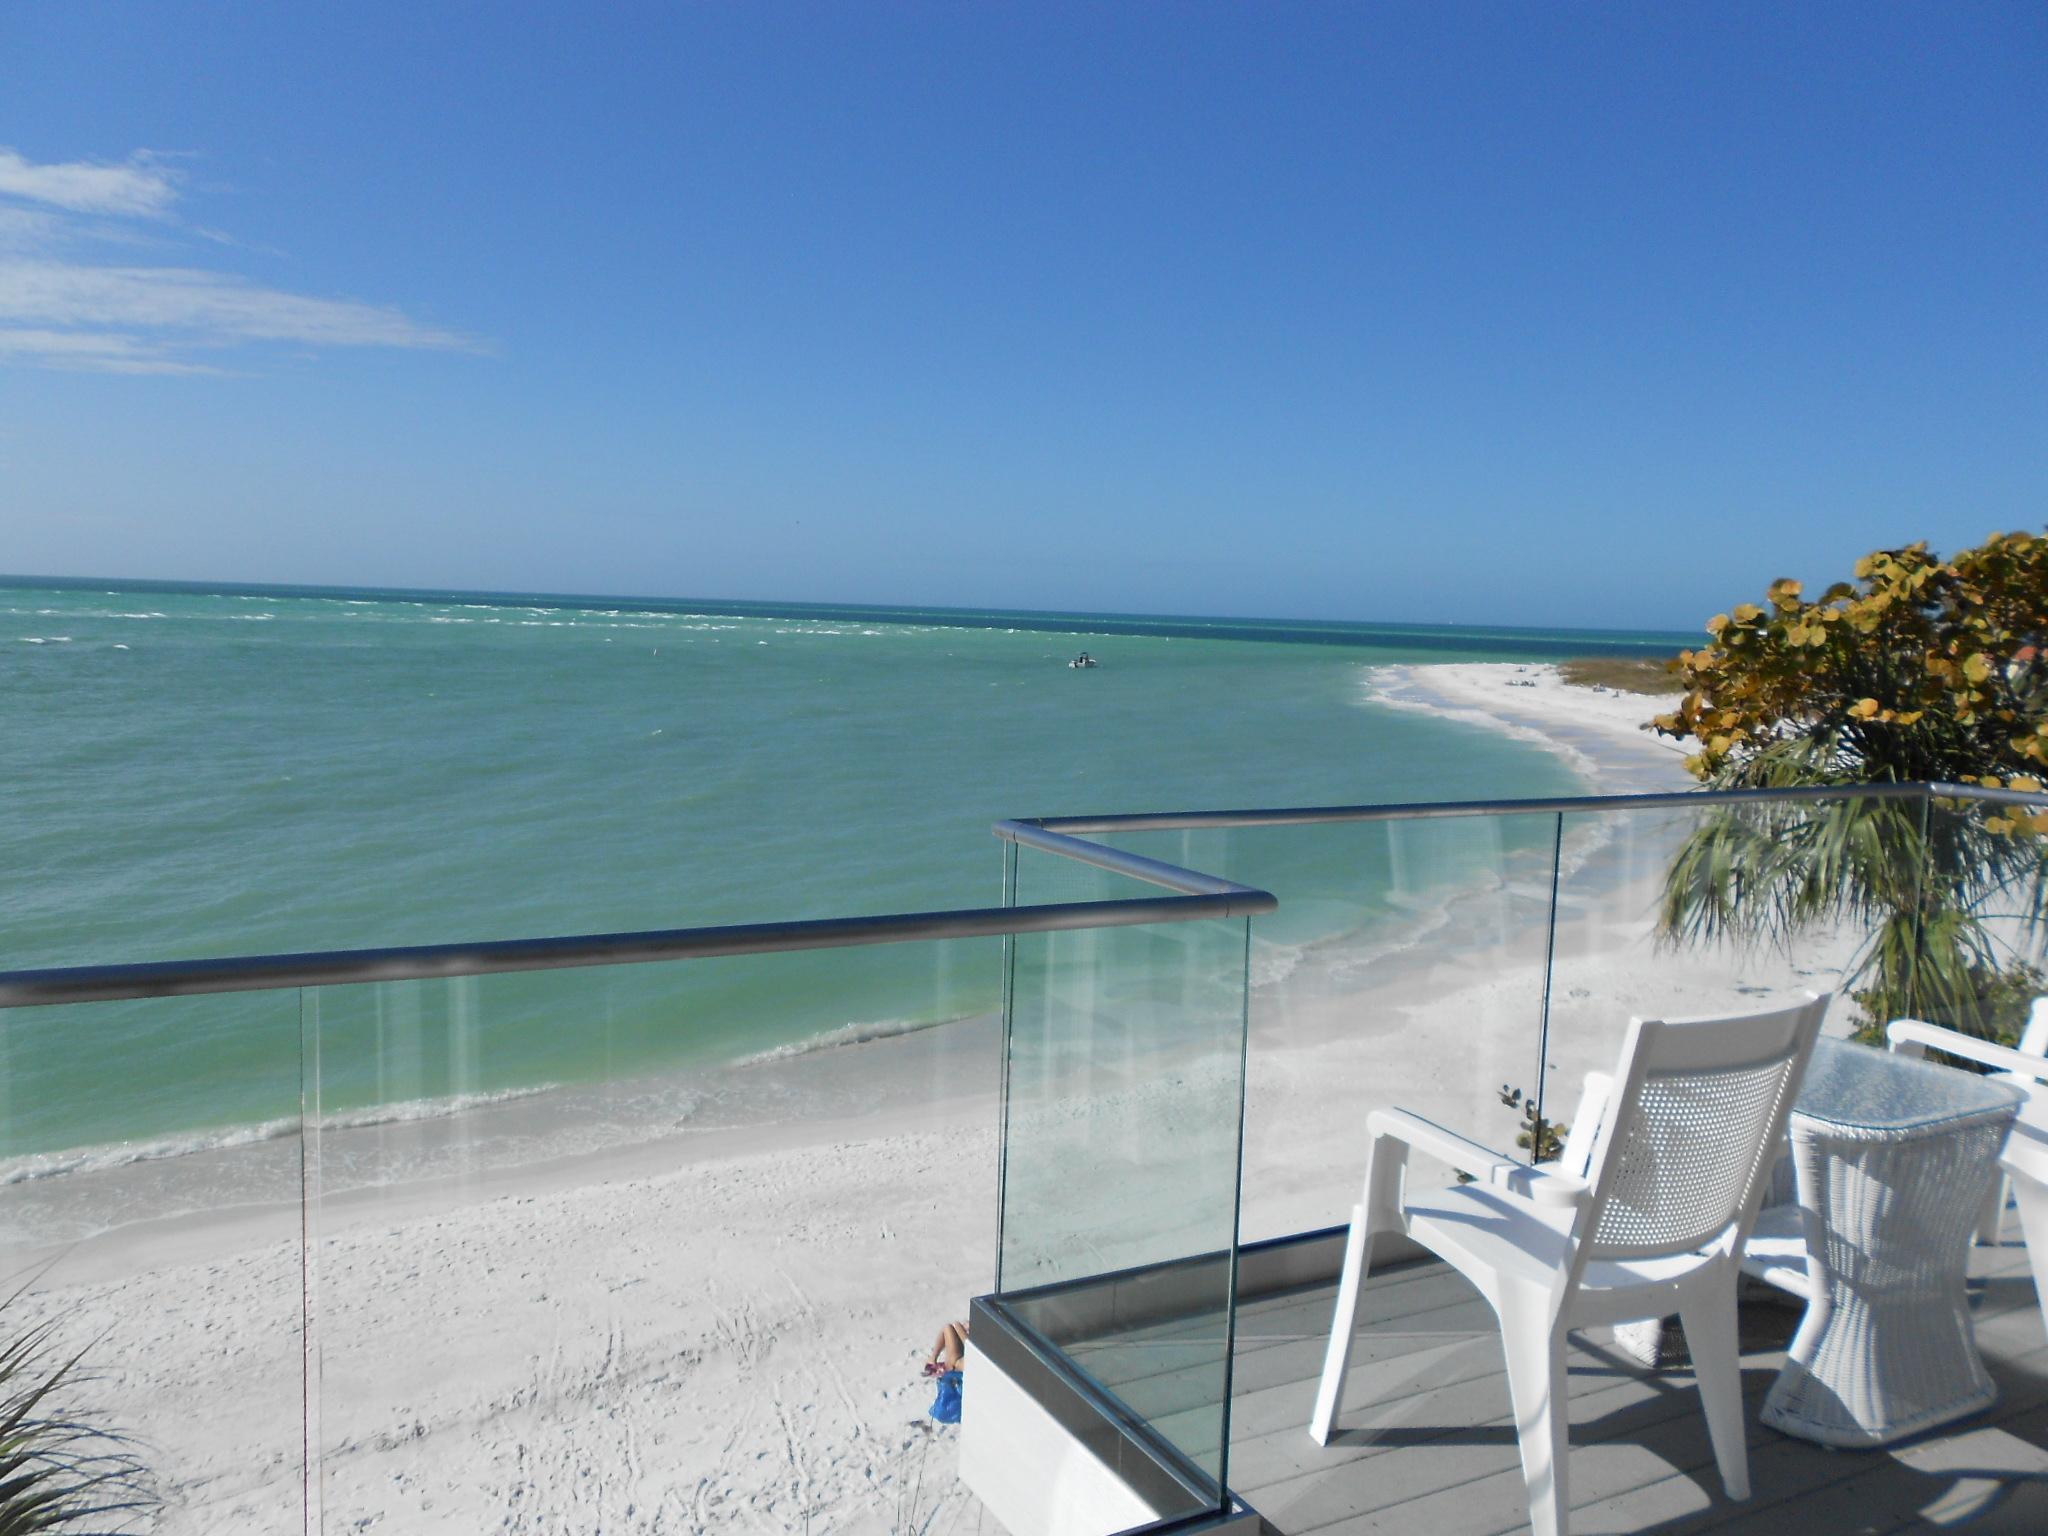 Anna Maria Beach Cottages Fl Architecture Modern Idea U2022 Rh Purple Echodigitalmedia Co Uk